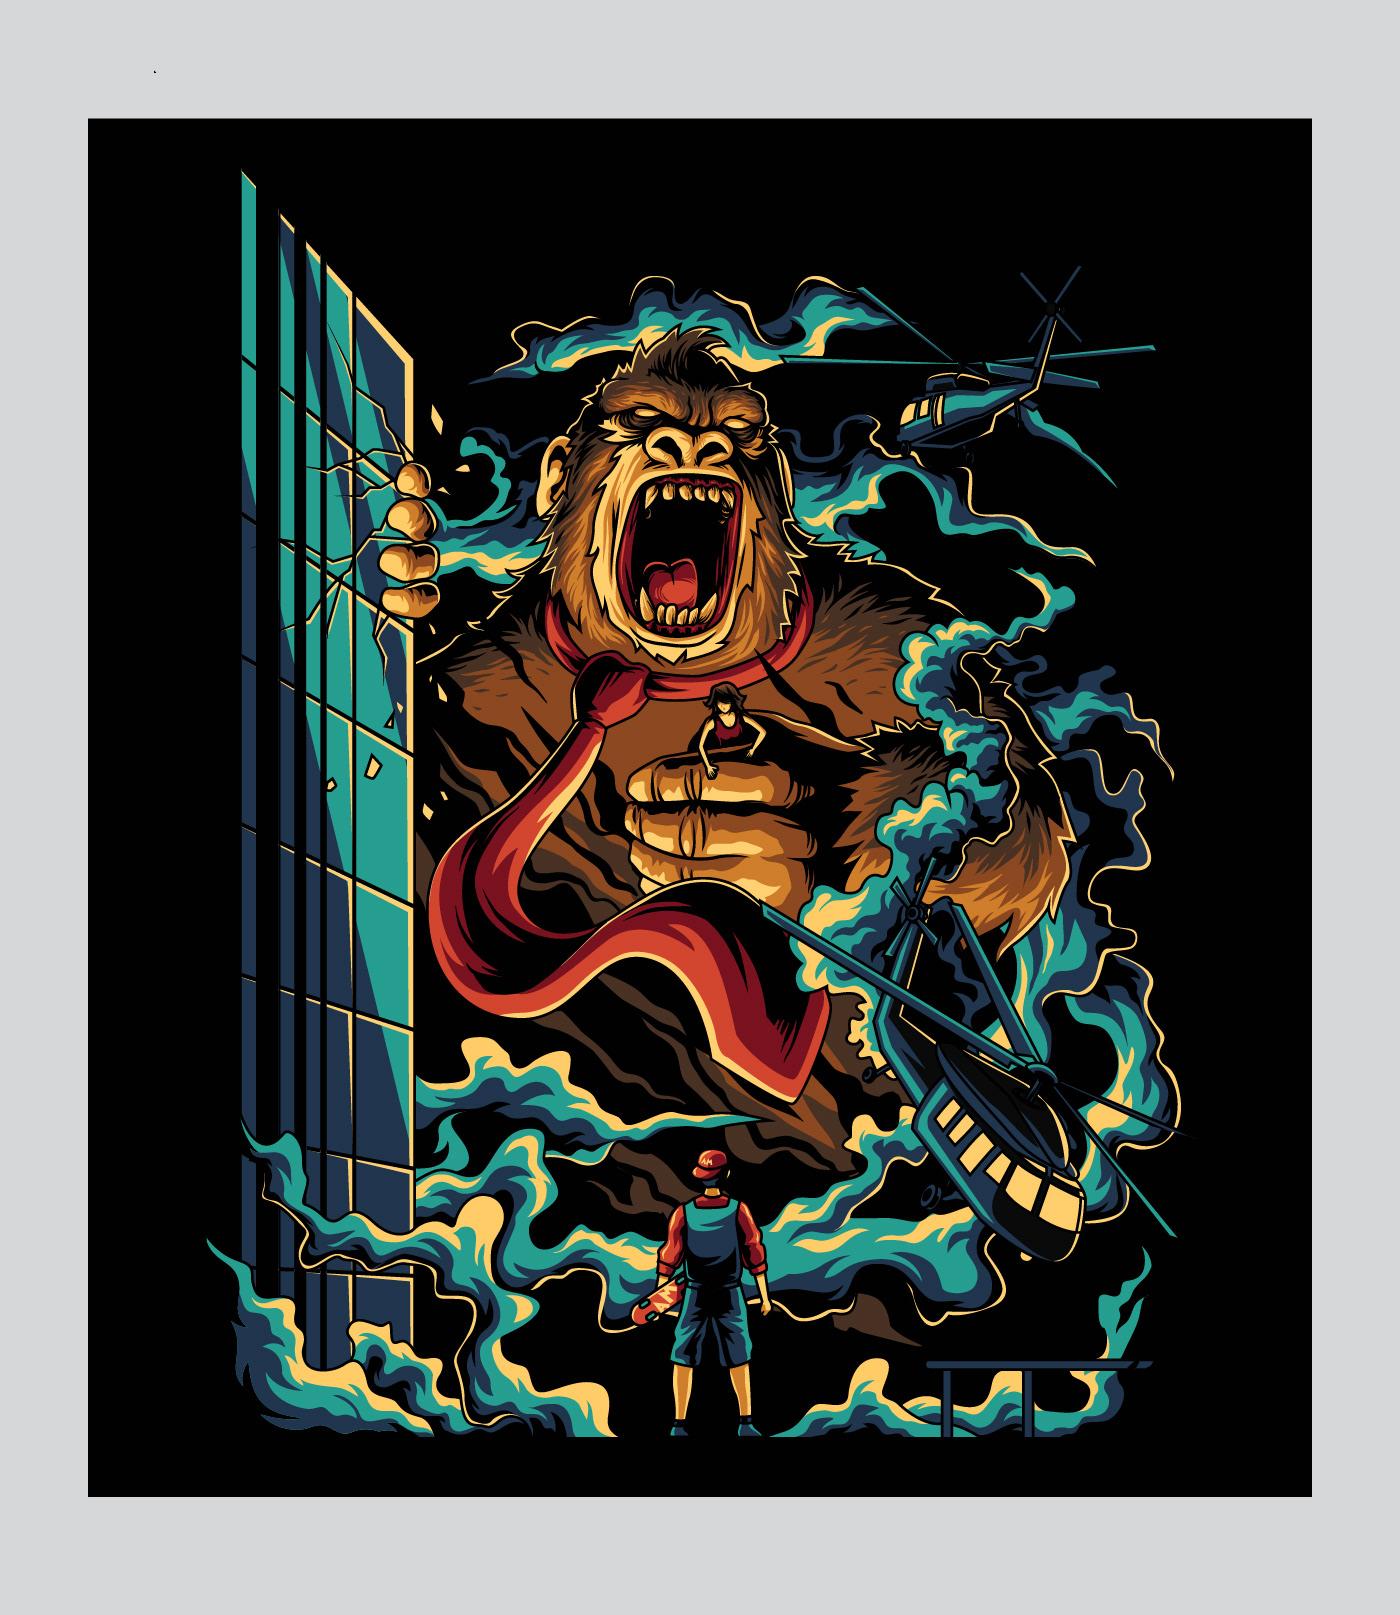 Ilustración Donkey Kong de Angga Tantama.